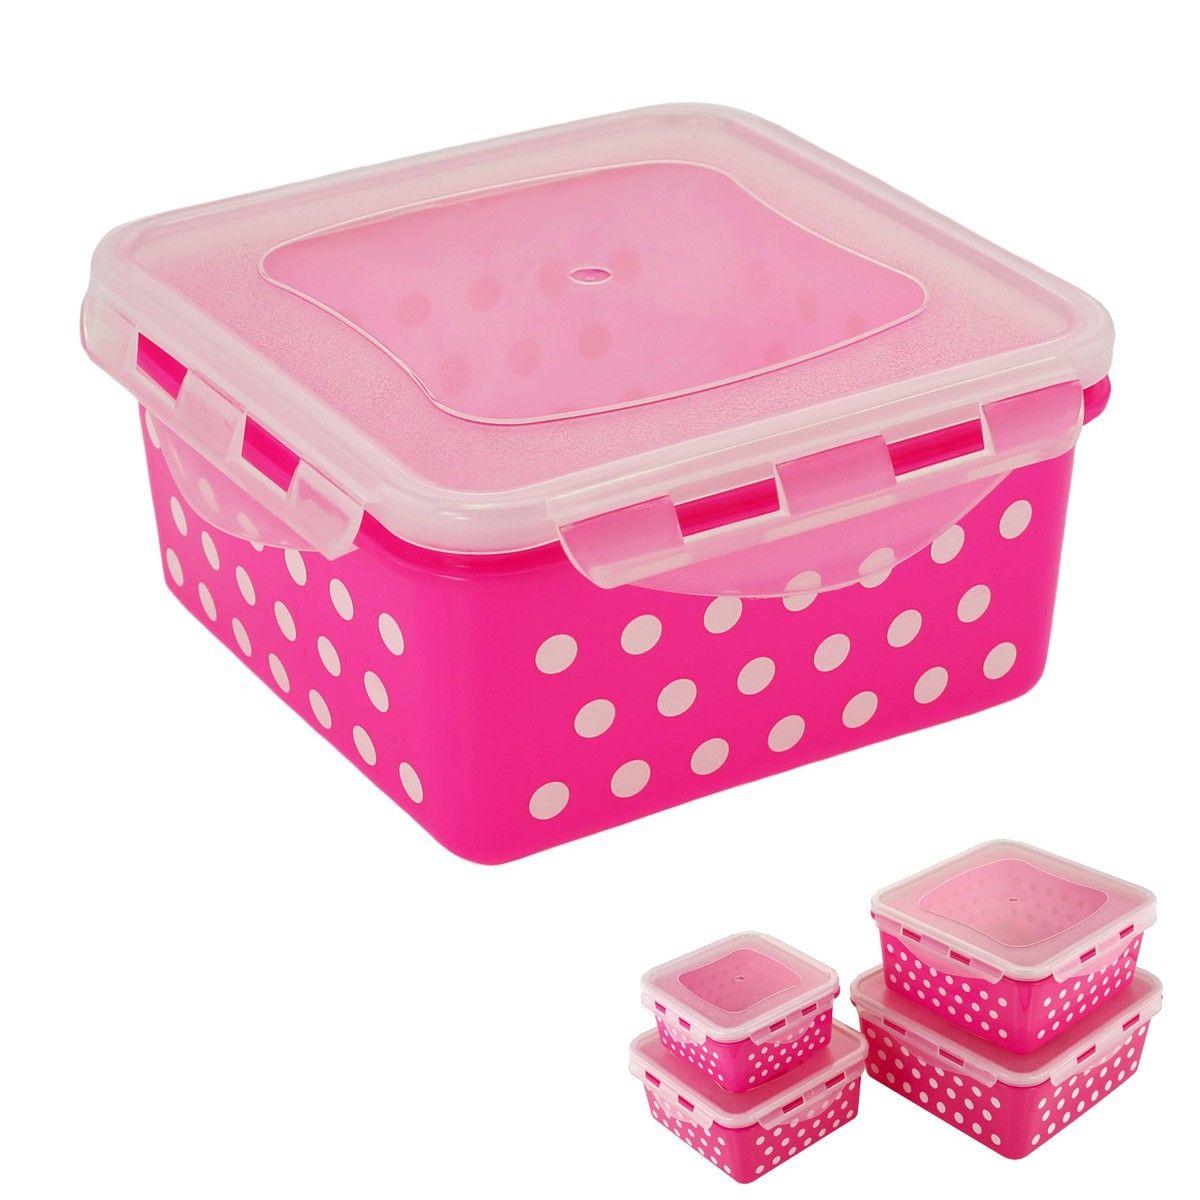 kitchens    locking square airtight food storage     locking square airtight food storage container set of 8 pink      rh   pinterest com